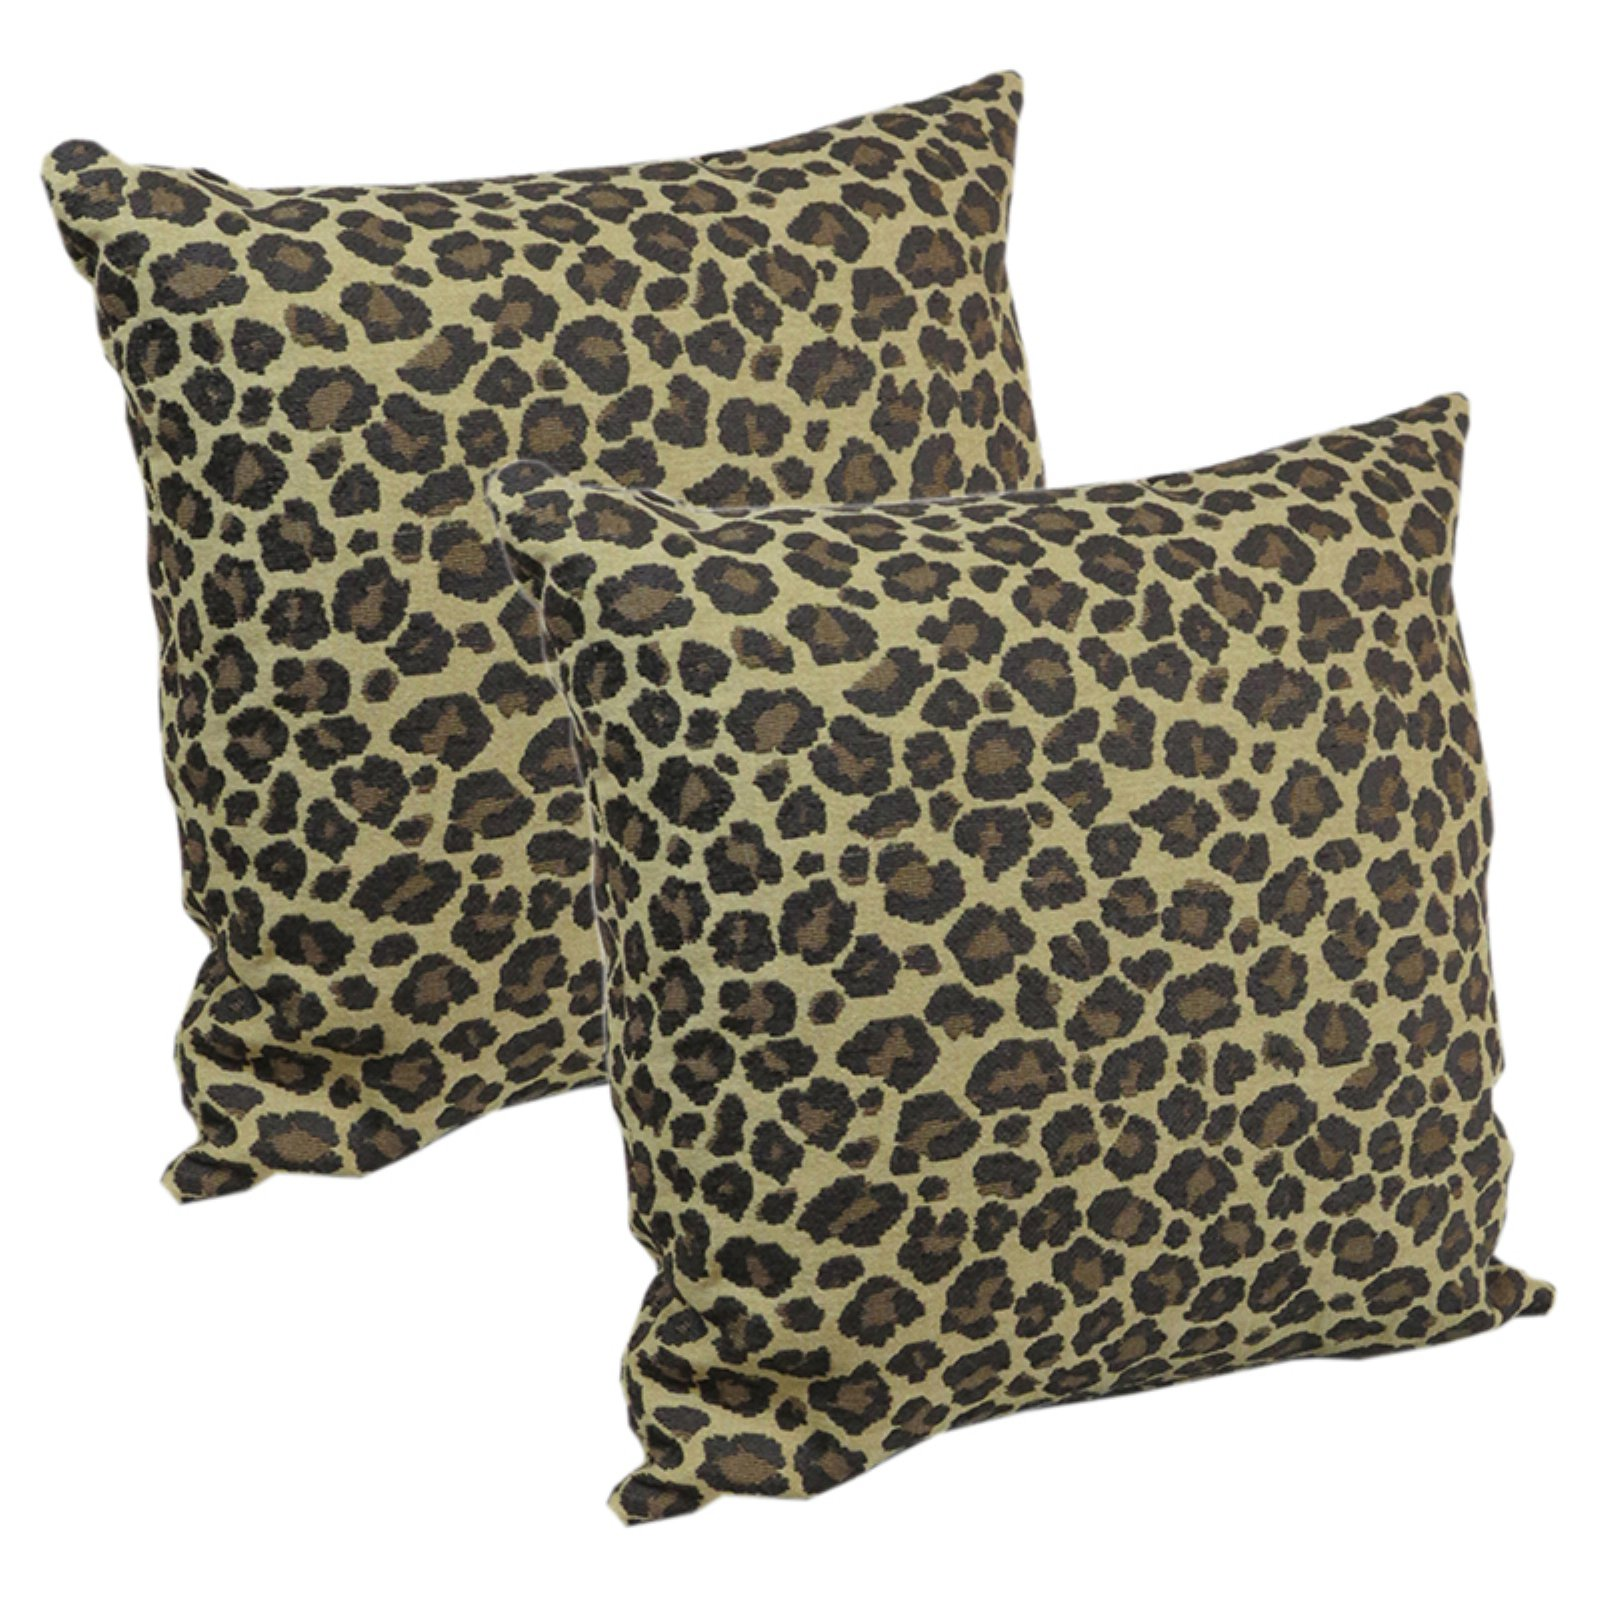 Klear Vu Faux Phat Cat Animal Skin Decorative Throw Pillow Set Of 2 Walmart Com Walmart Com